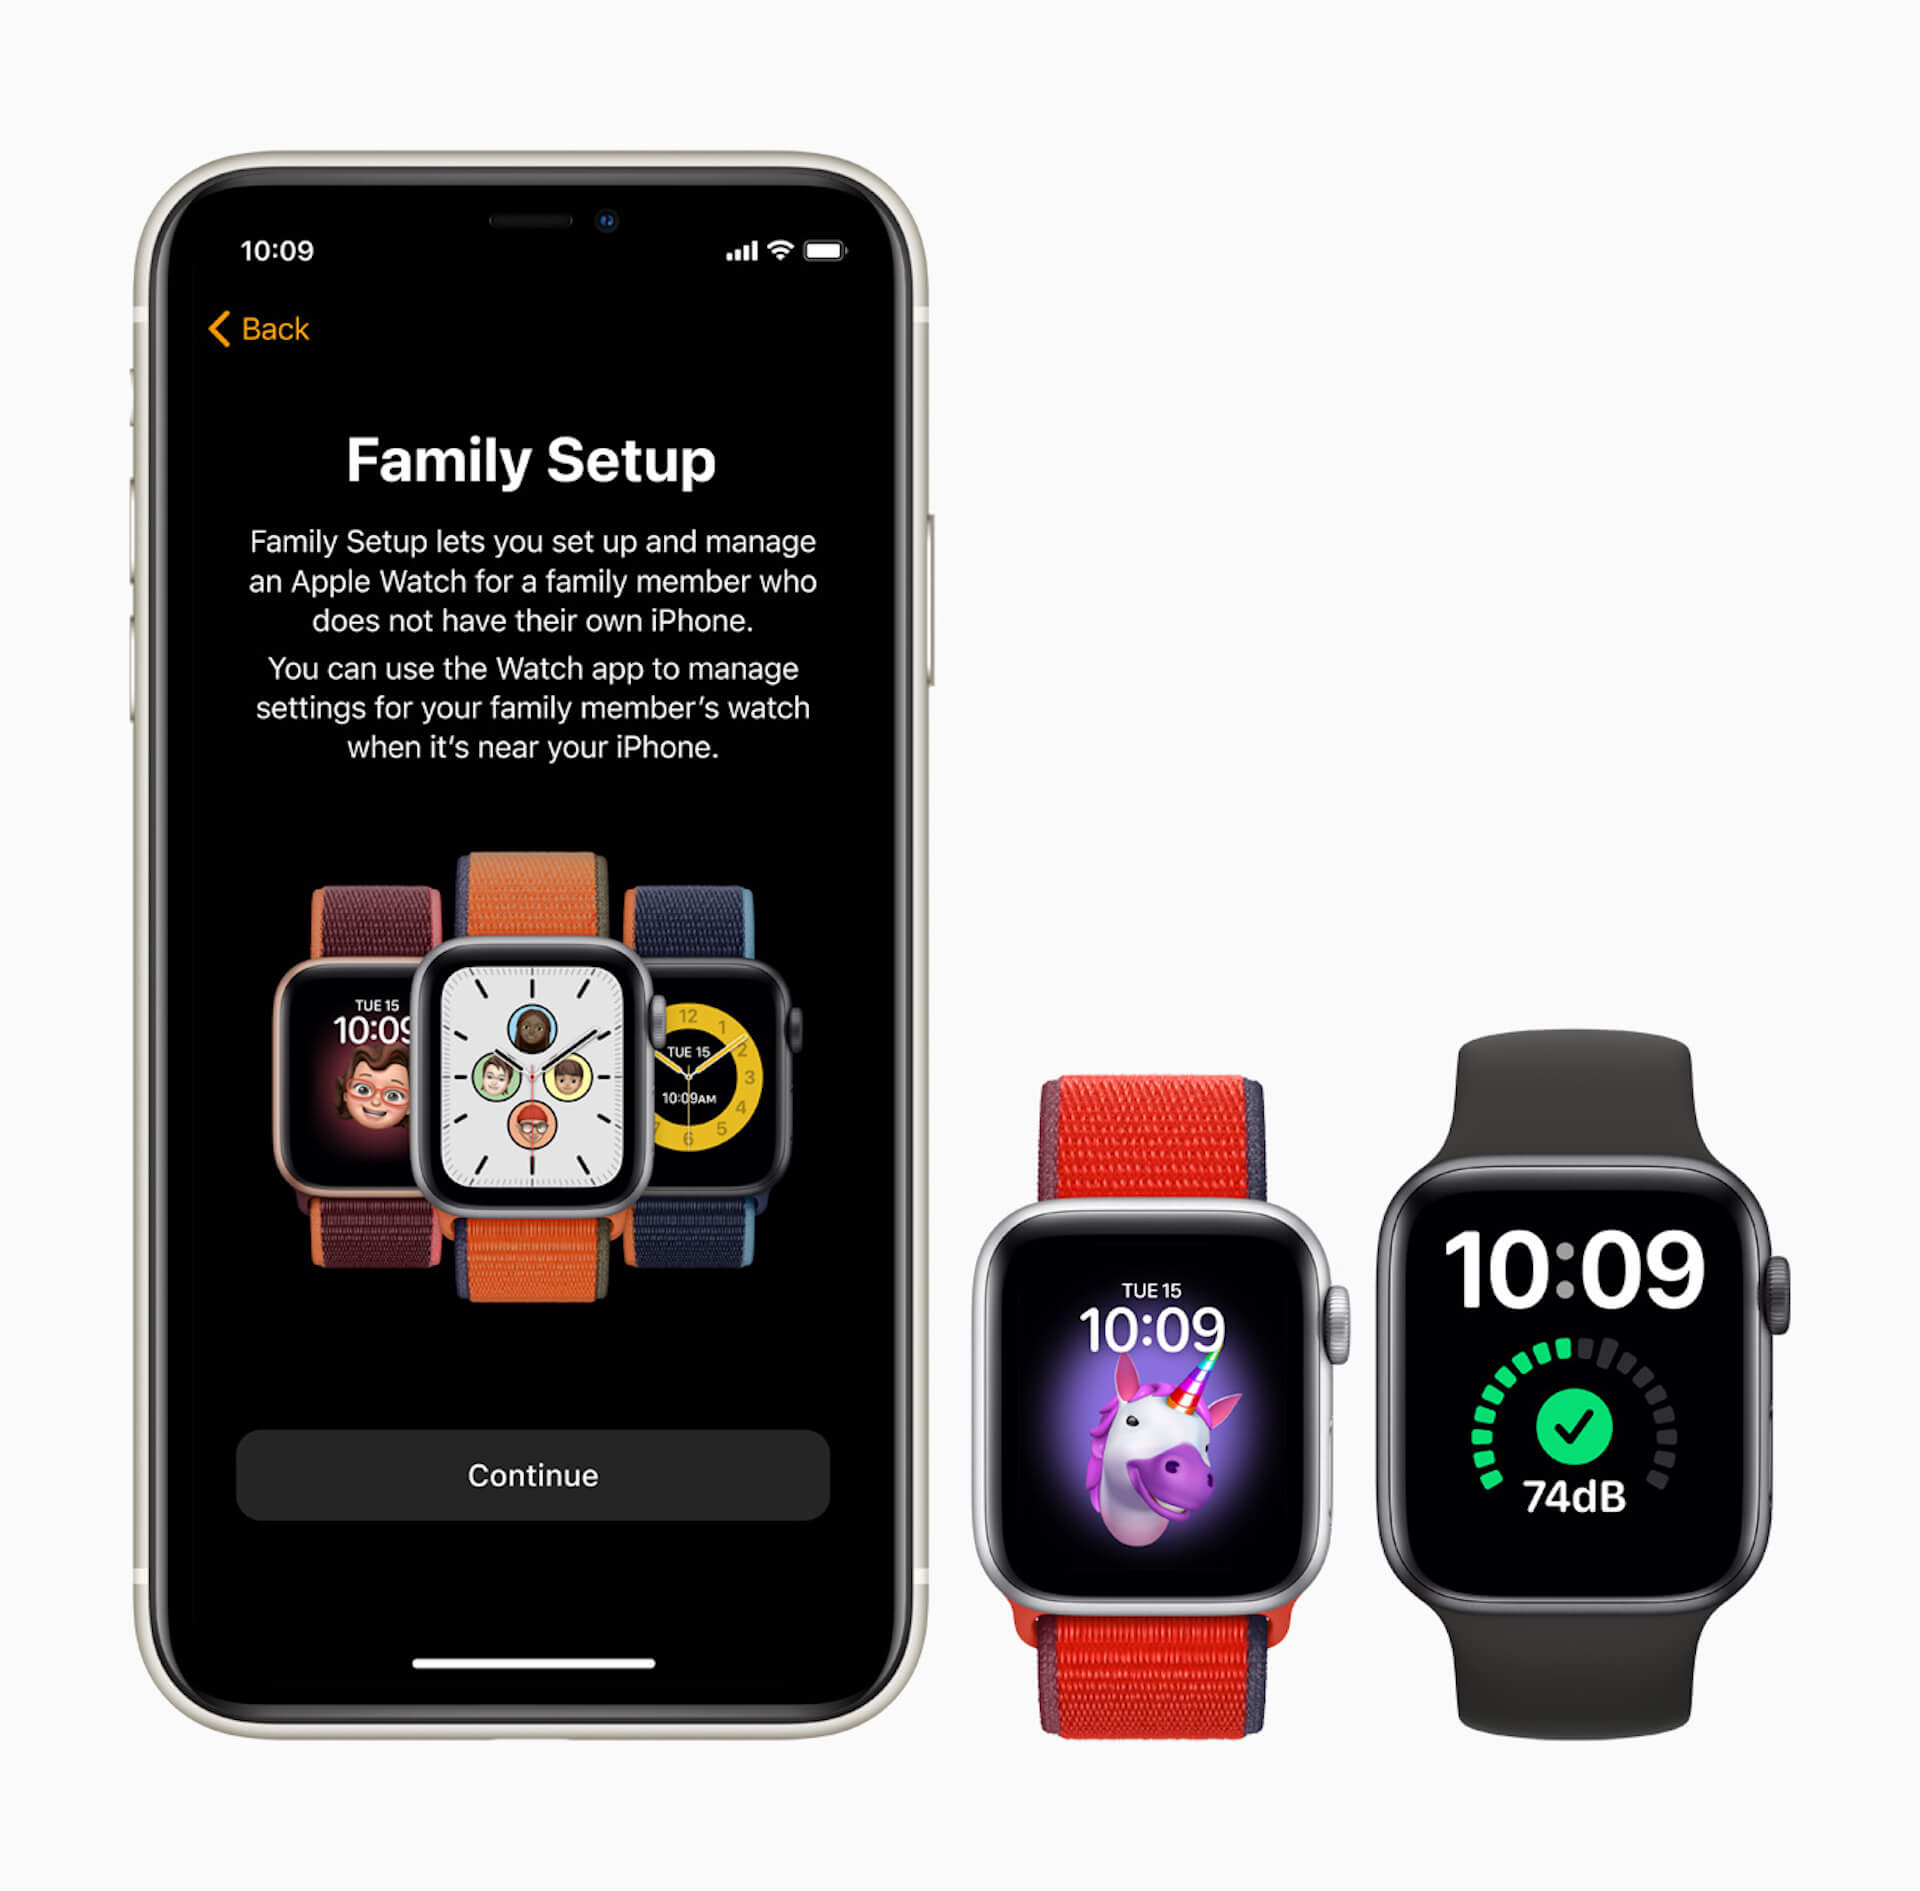 Apple Watchを利用すれば、マスクを着用したままiPhoneのFace IDを解除できるようになる?iOS 14.5で実現か tech210202_iphone_applewatch_main